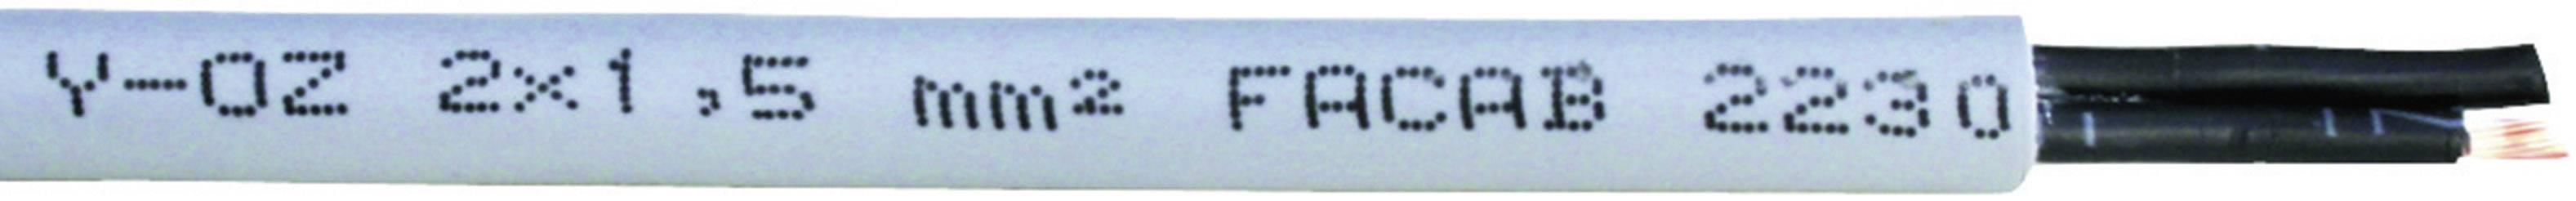 Riadiaci kábel Faber Kabel YSLY-OZ 030634, 7 x 1 mm², vonkajší Ø 8.20 mm, 500 V, metrový tovar, sivá